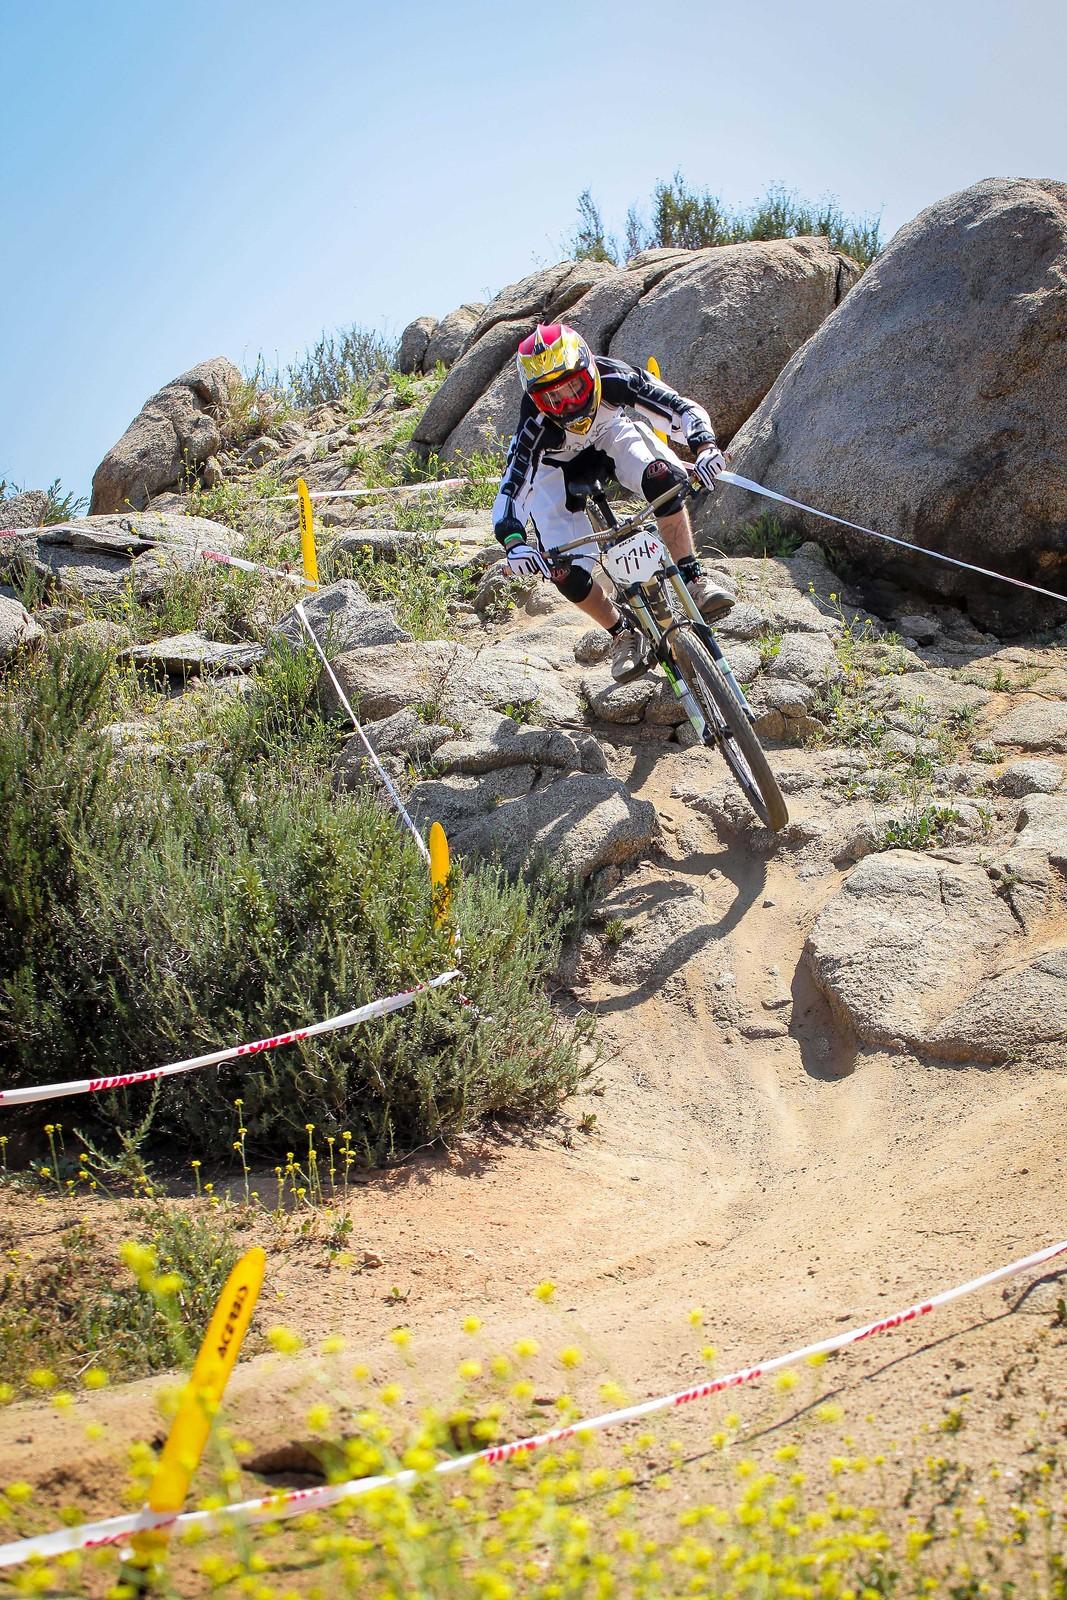 IMG 3252 - GnarHuck - Mountain Biking Pictures - Vital MTB